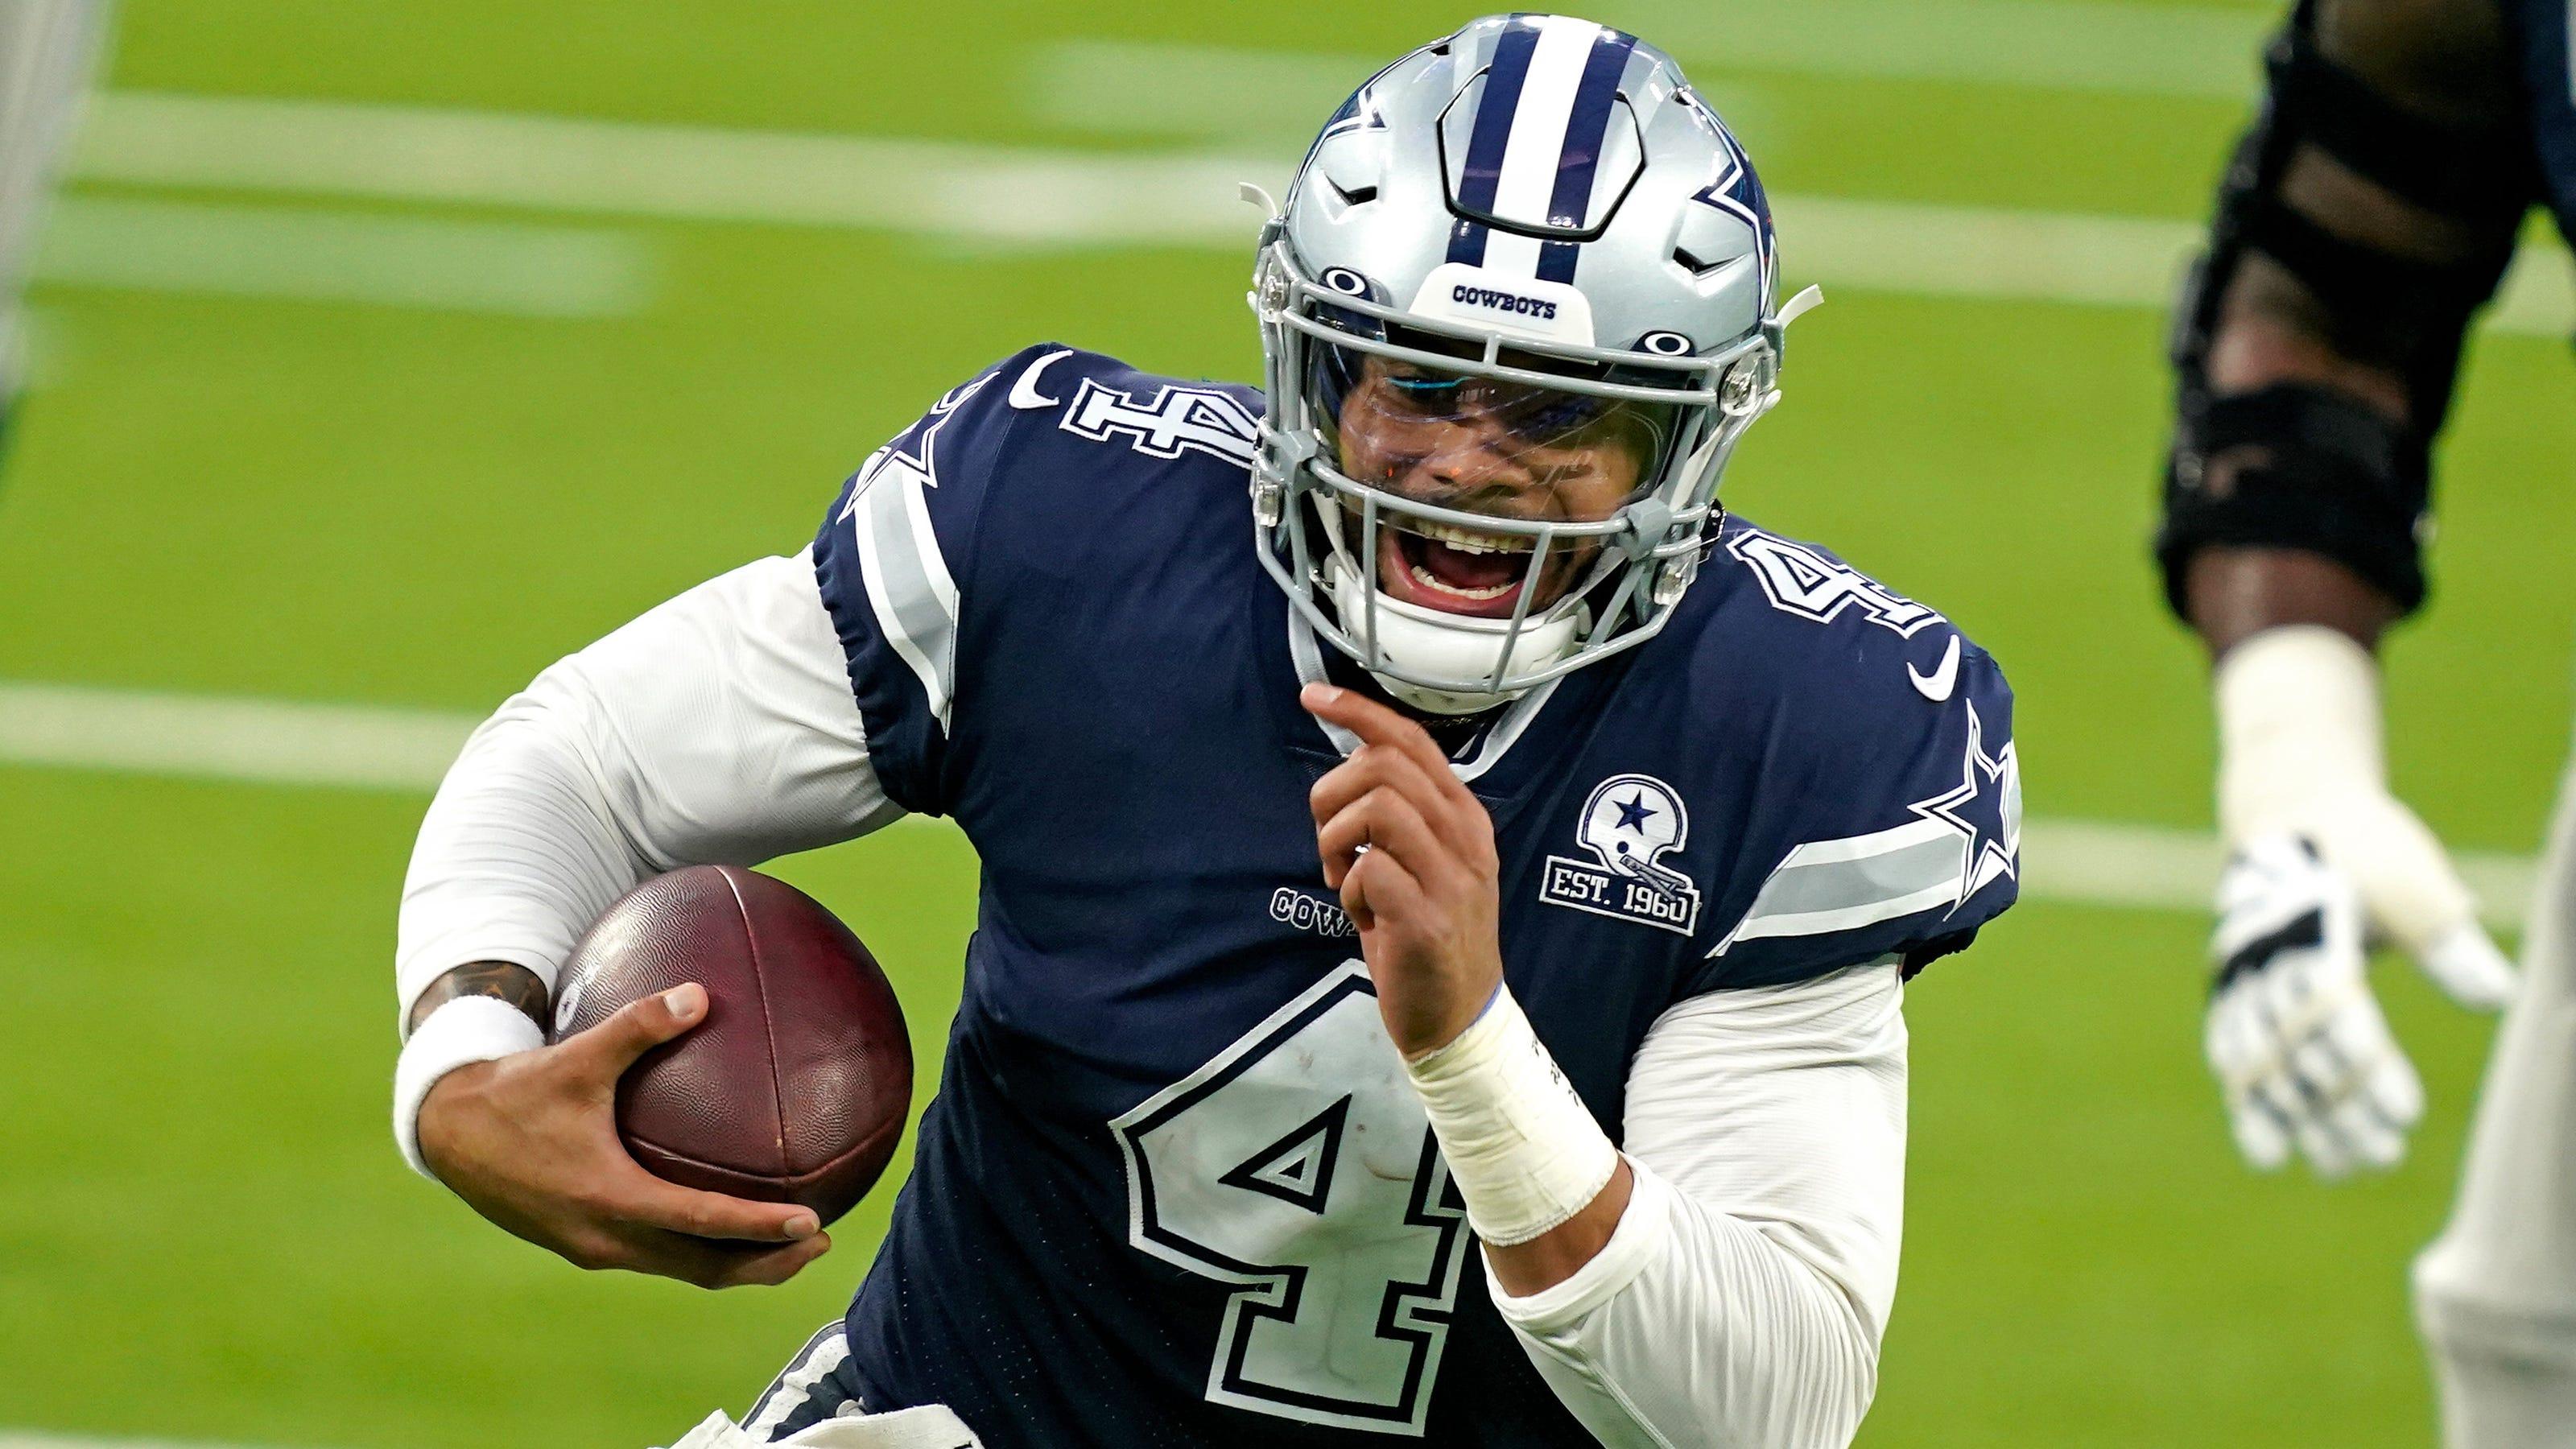 Dak Prescott, Cowboys agree to terms on 4-year deal worth $160 million